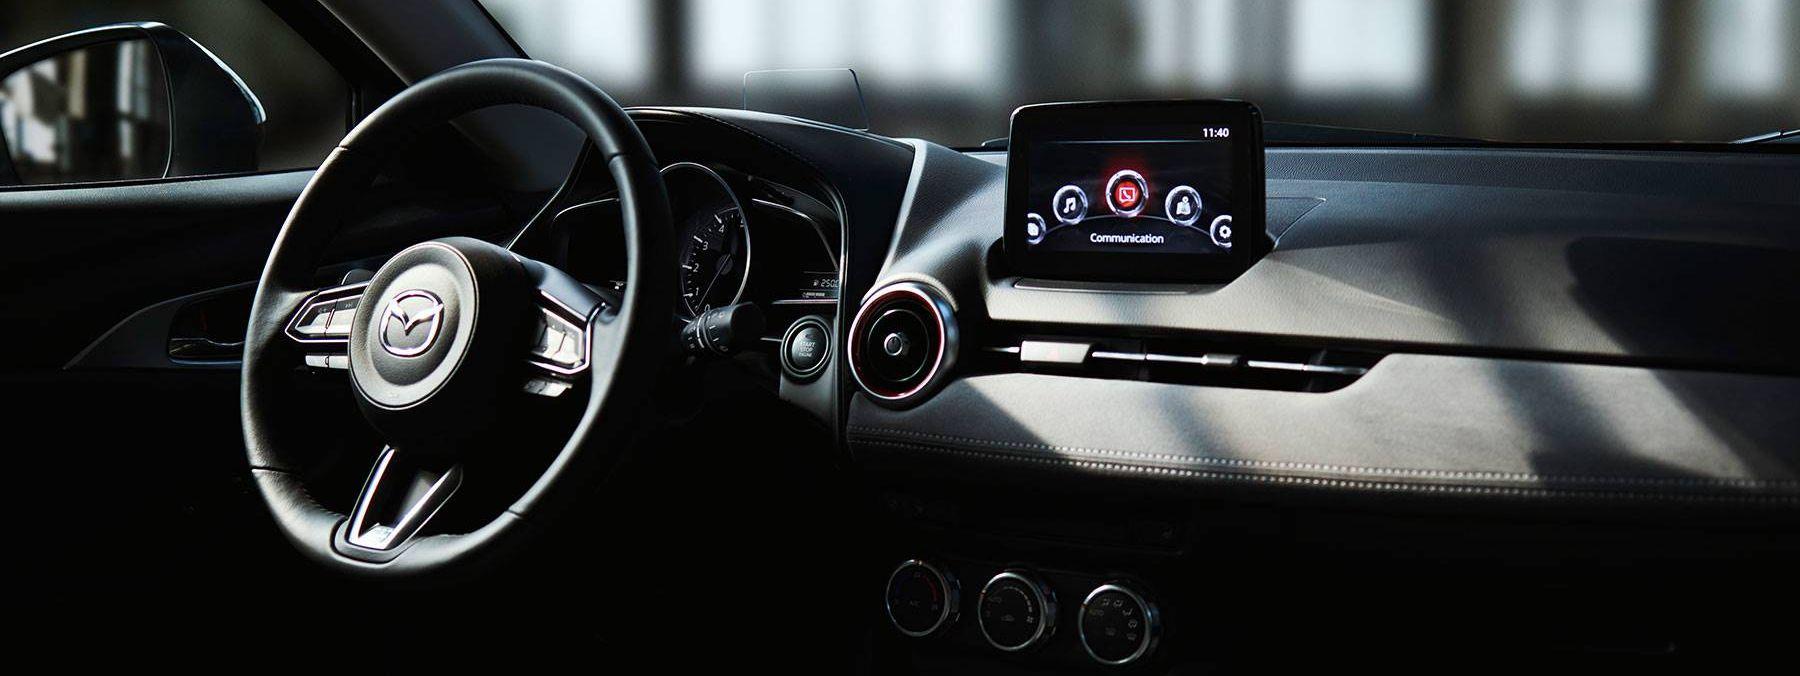 Stunning Interior of the Mazda CX-3